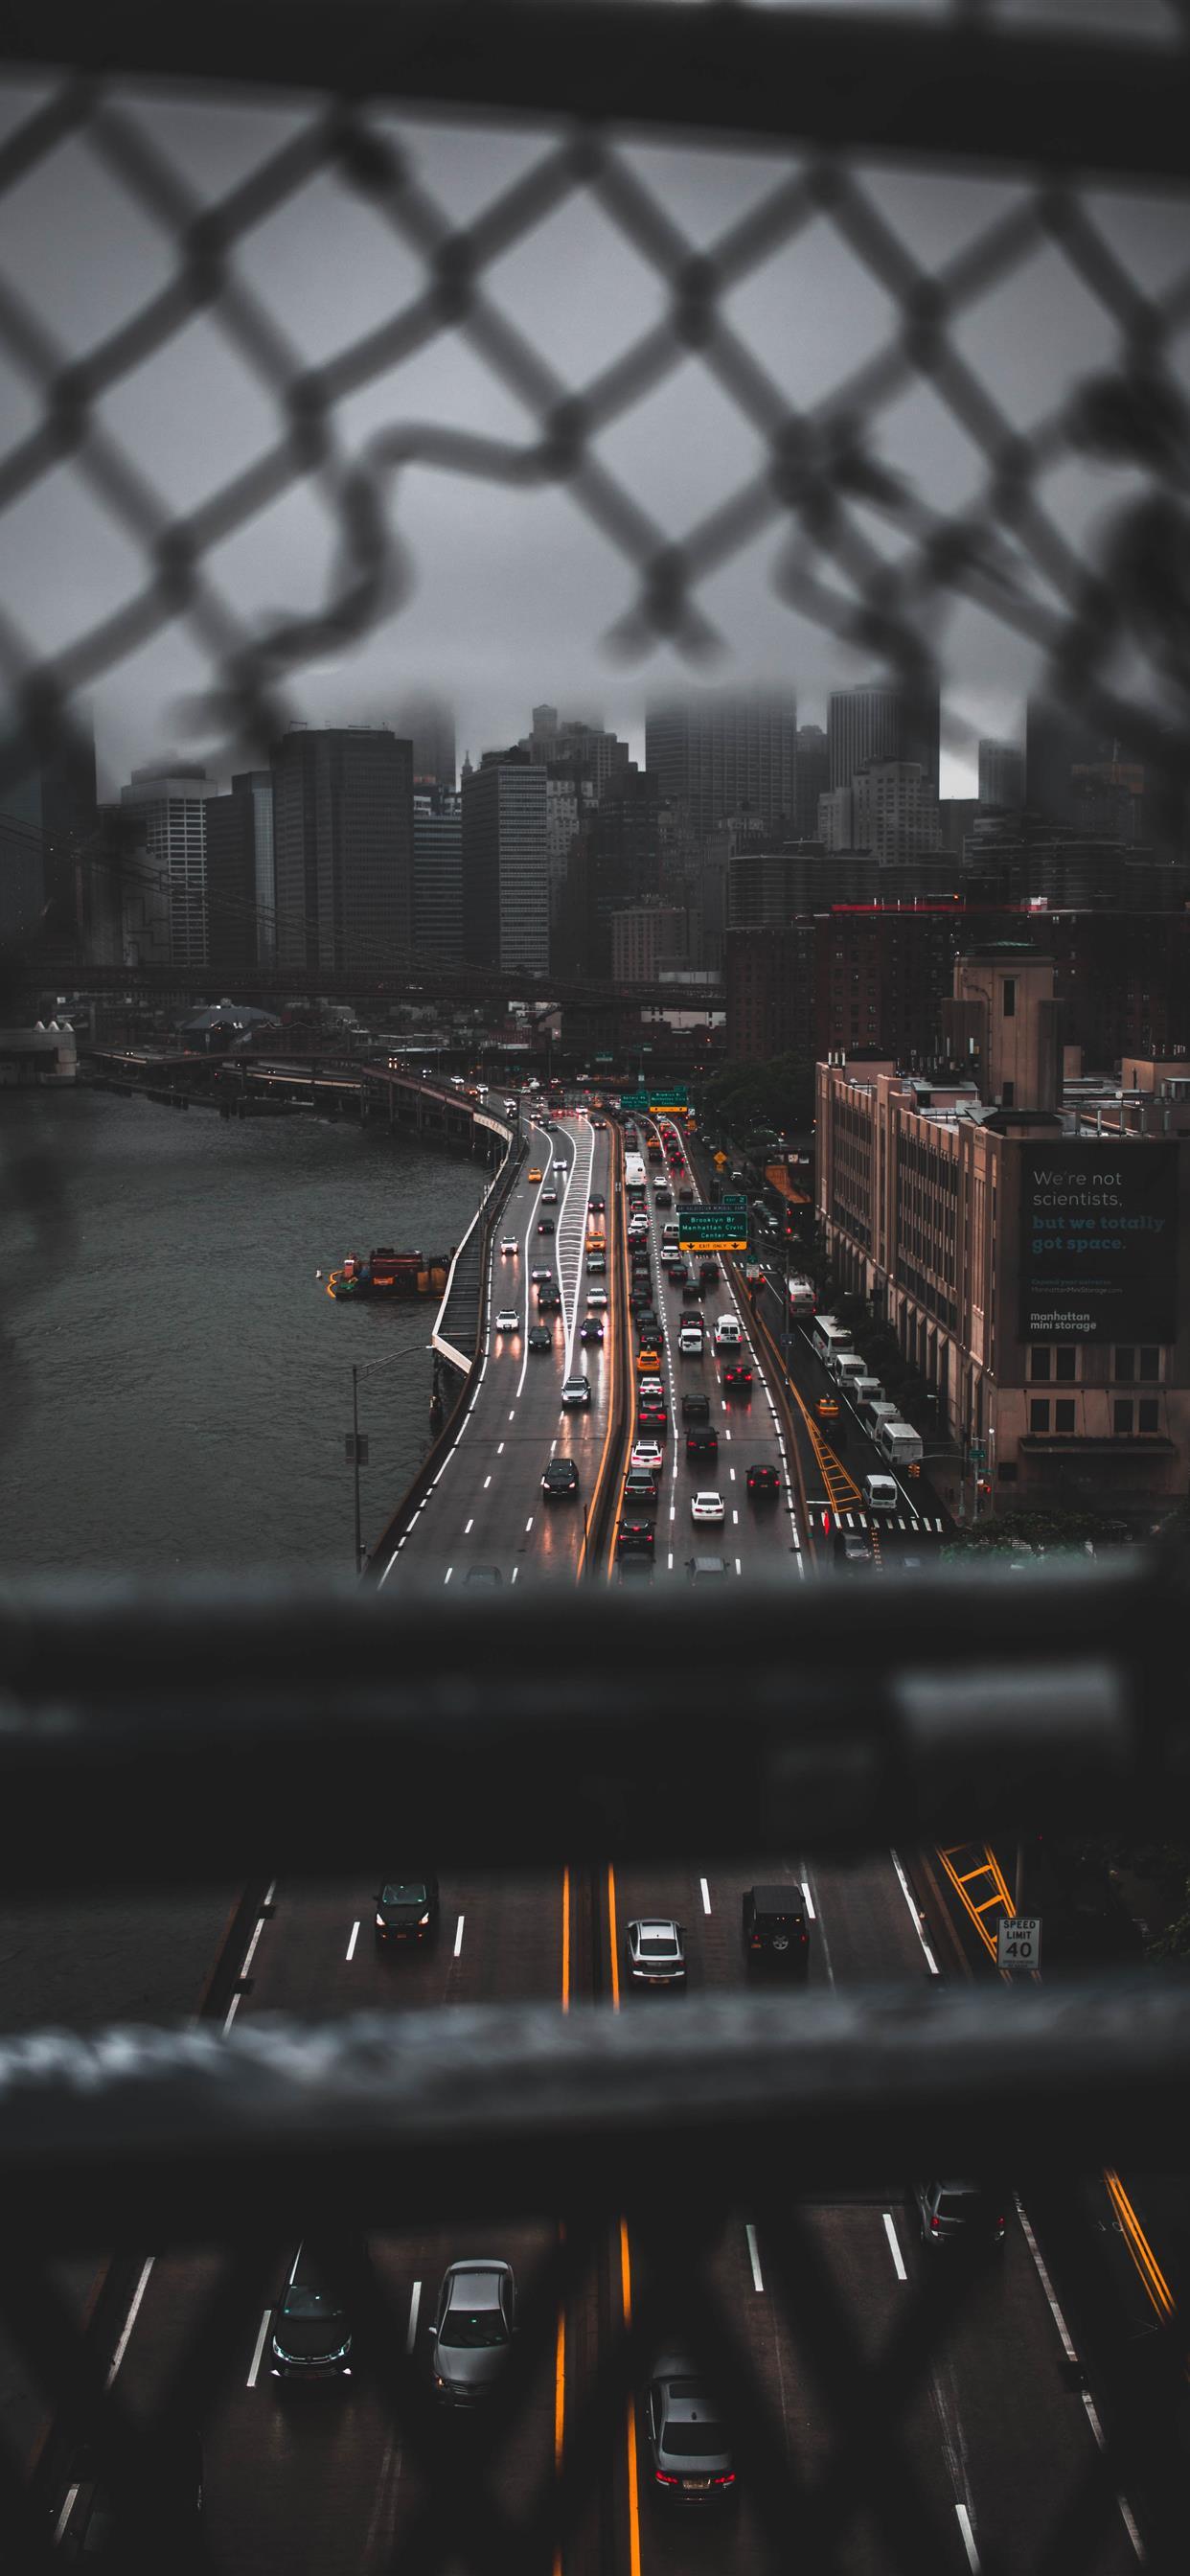 Iphone 11 New York 1242x2688 Wallpaper Teahub Io